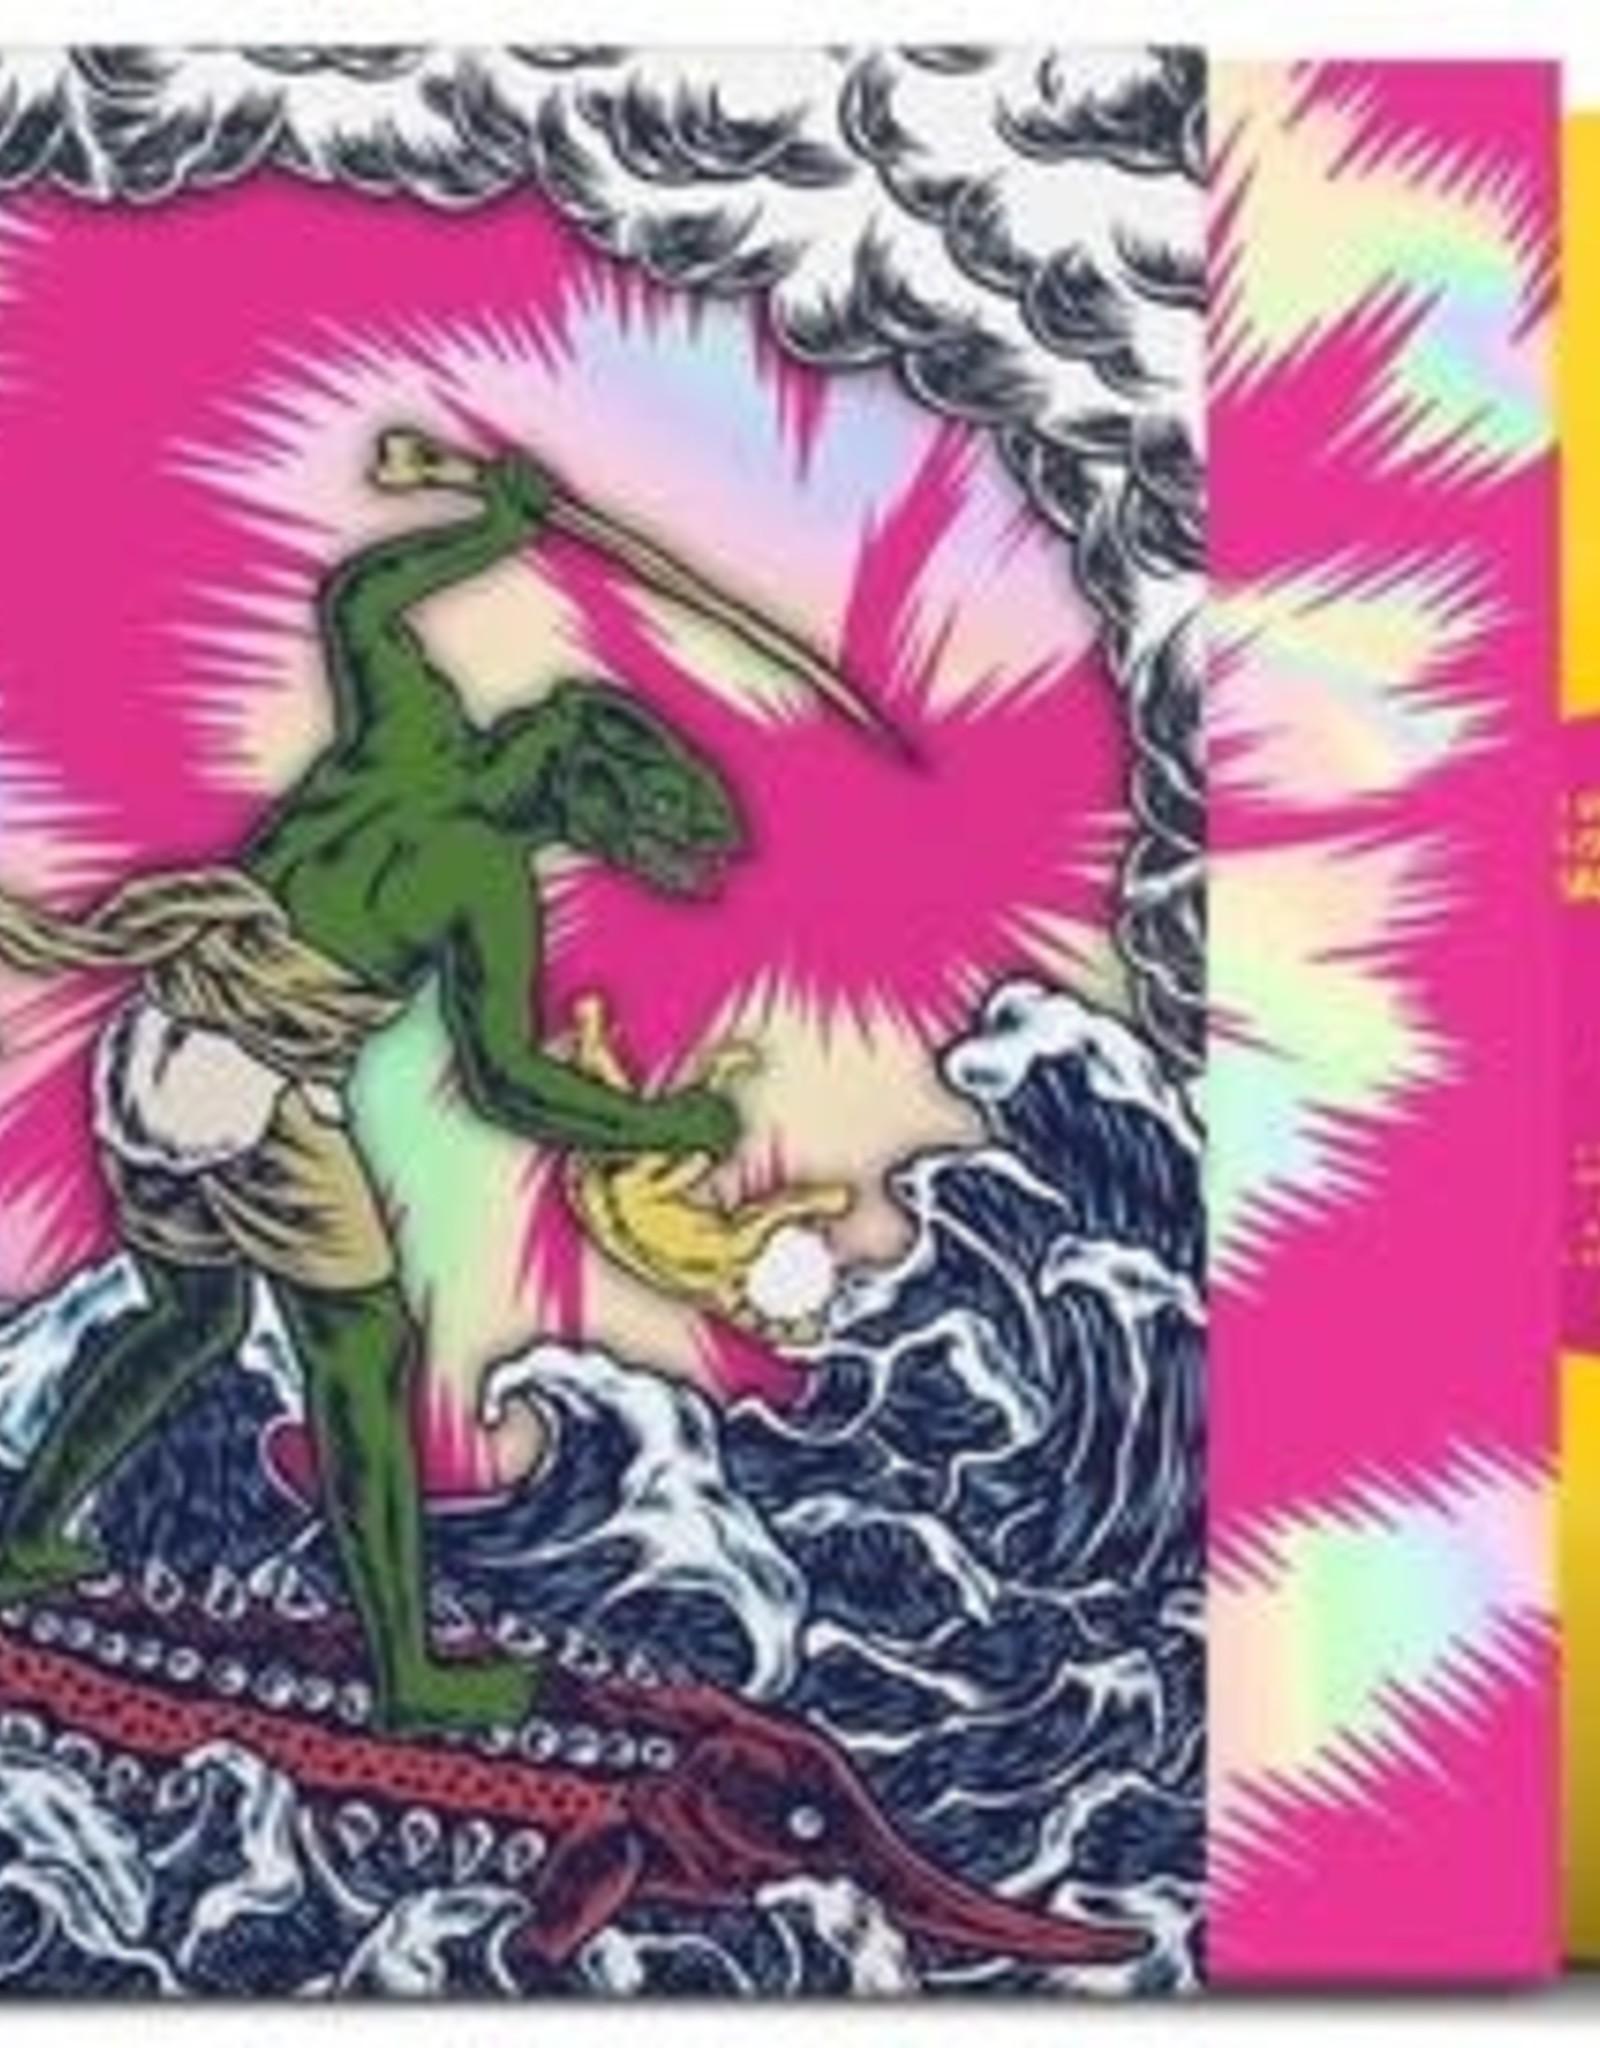 King Gizzard and the Lizard Wizard - Teenage Gizzard (Yellow/Pink Splatter Vinyl, Die Cut Sleeve)